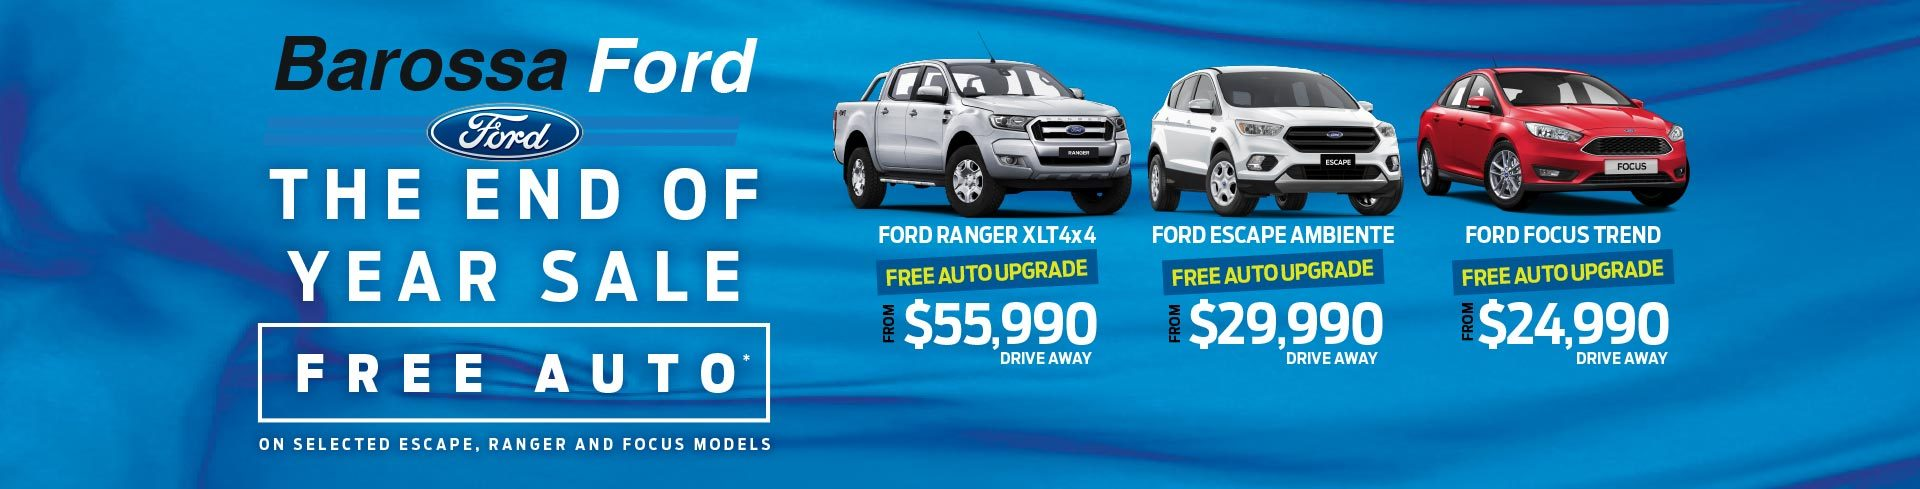 Barossa Ford Local Specials